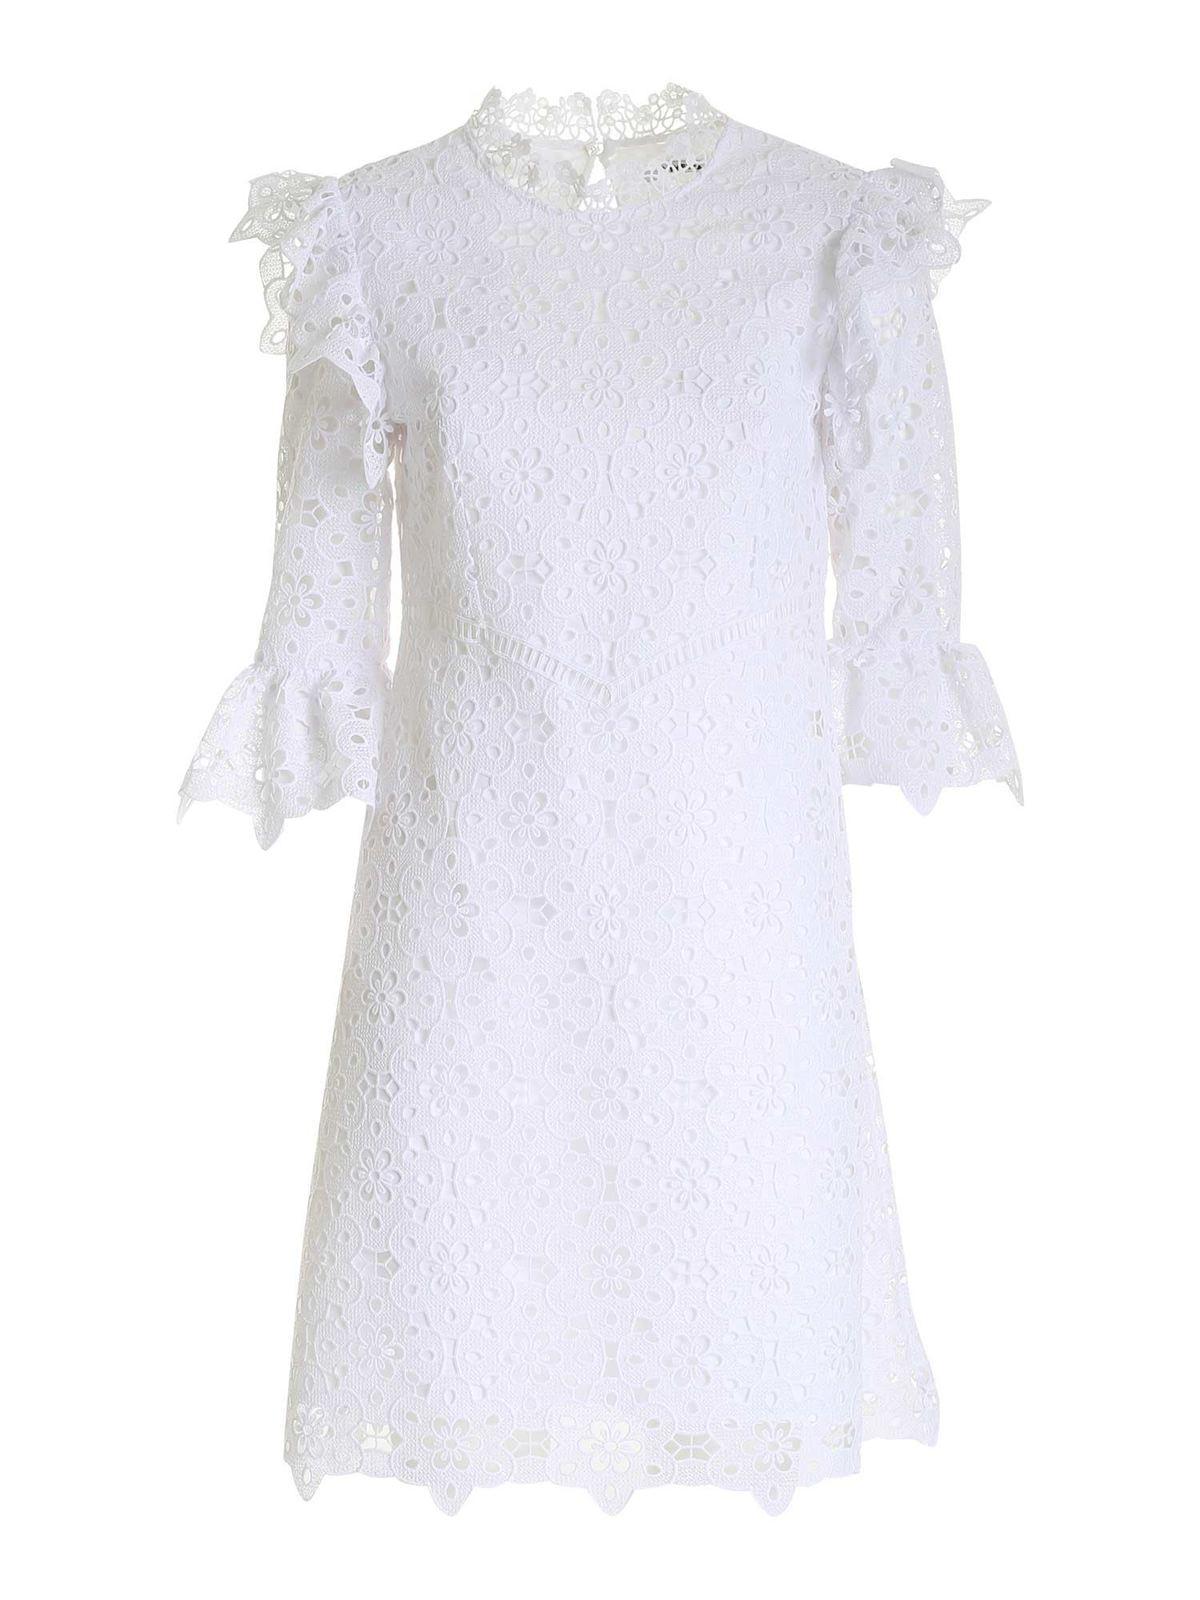 Vivetta LACE DETAIL DRESS IN WHITE